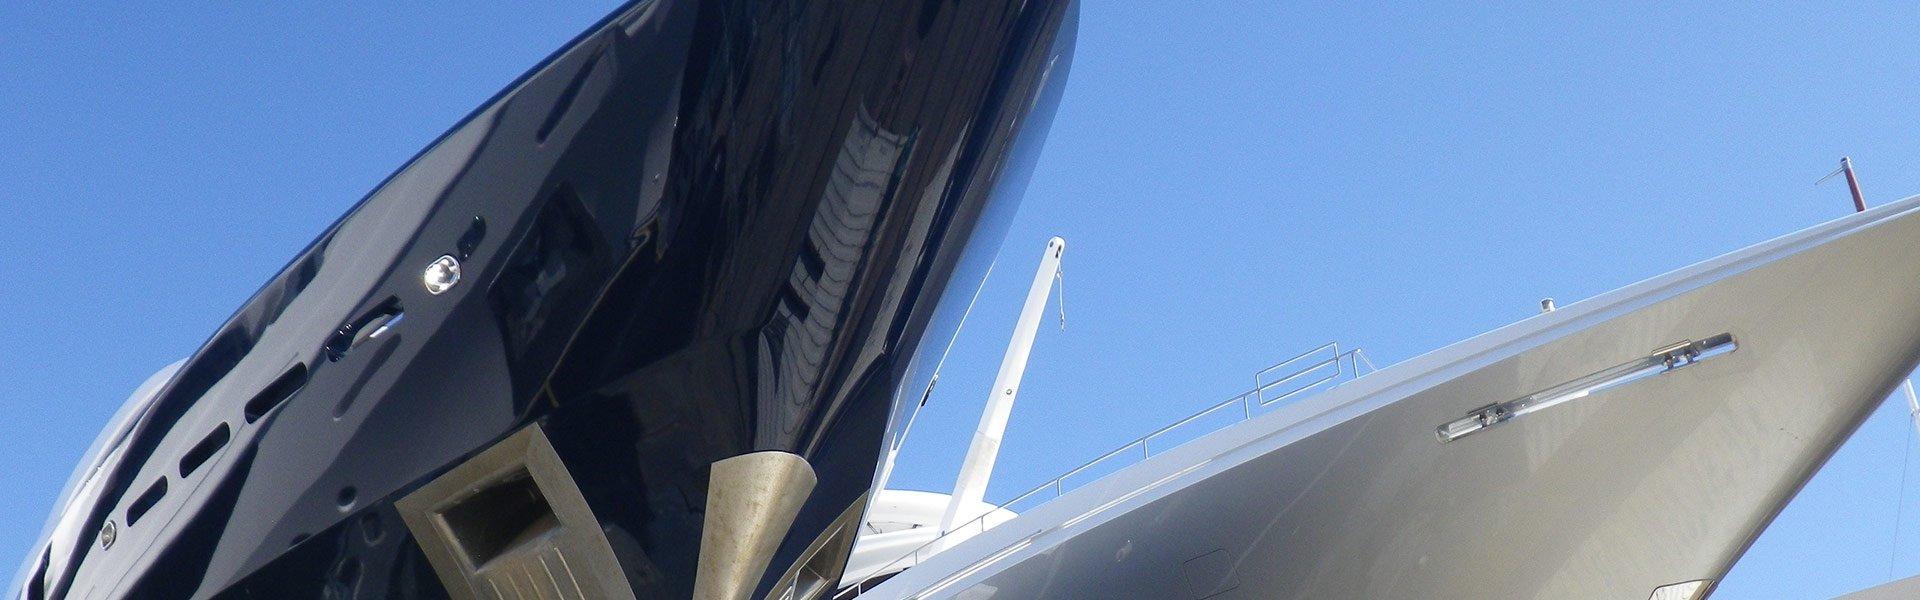 Yacht Coatings Sector – Mega Yacht Bows